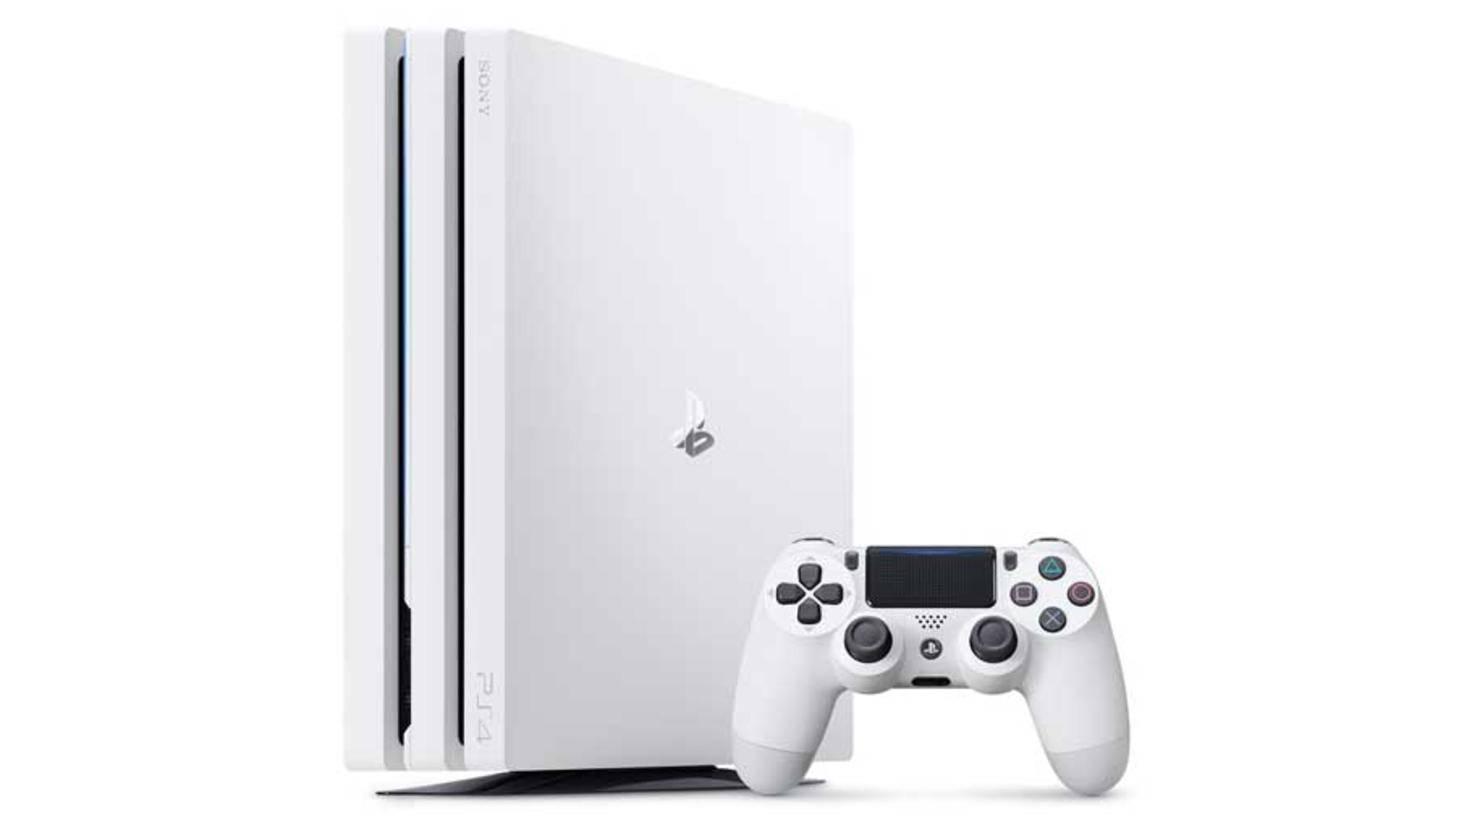 PS4-Pro-Glacier-White-Weiss